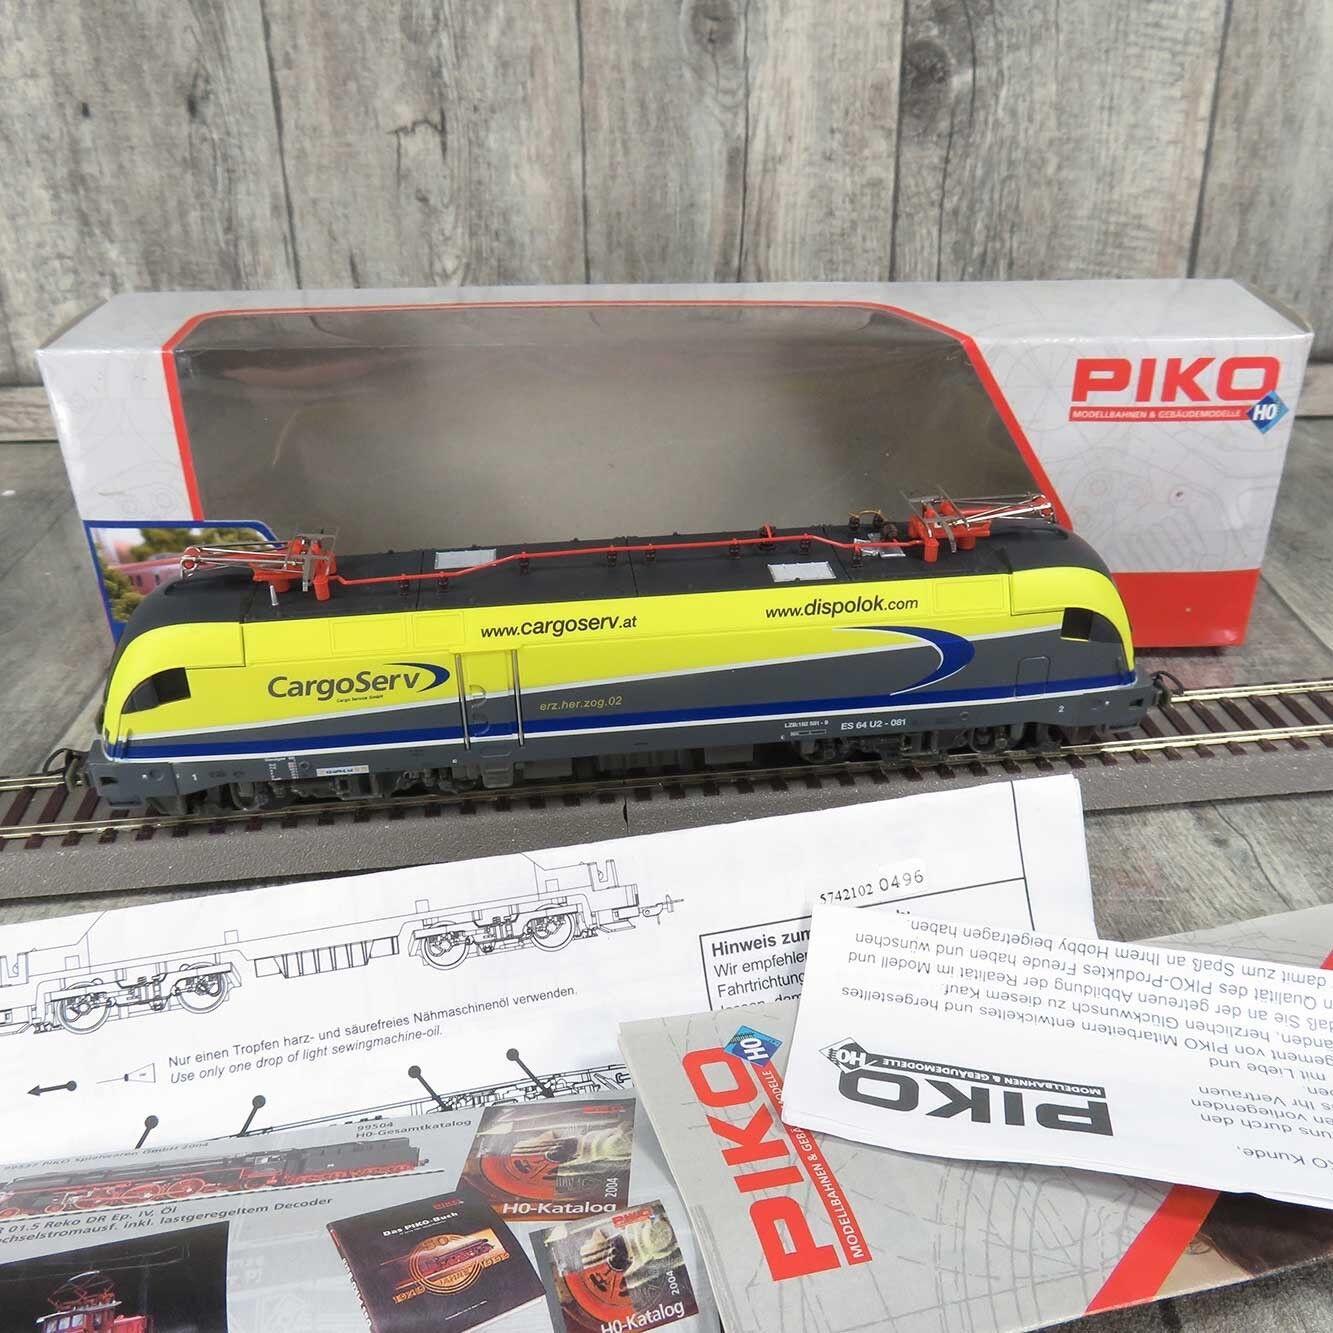 sconto online PIKO 57421 - HO - ÖBB - E-Lok autogo Serv Serv Serv ES64U2-081 - mit DSS - OVP -  G26456  liquidazione